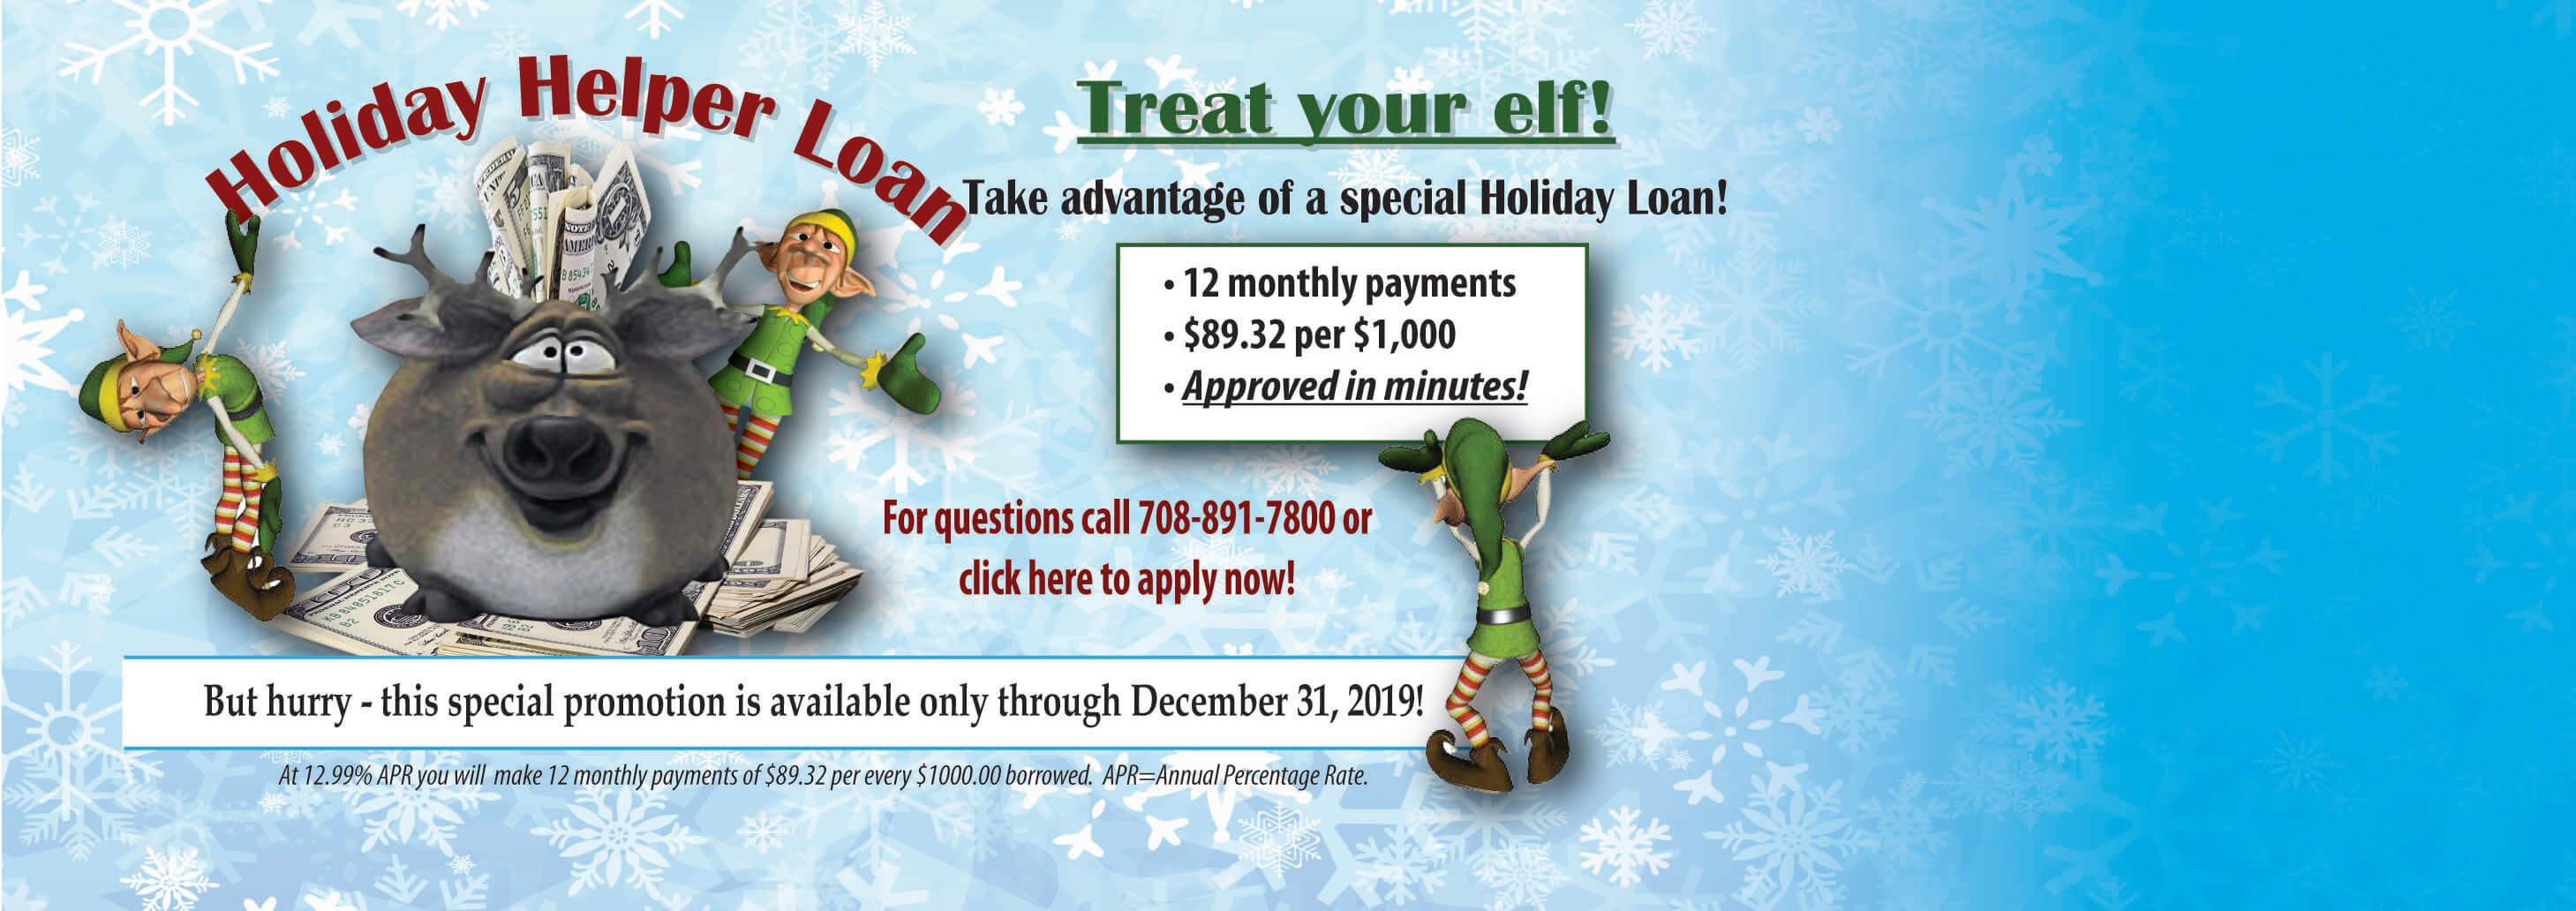 Apply now through December 31,2019